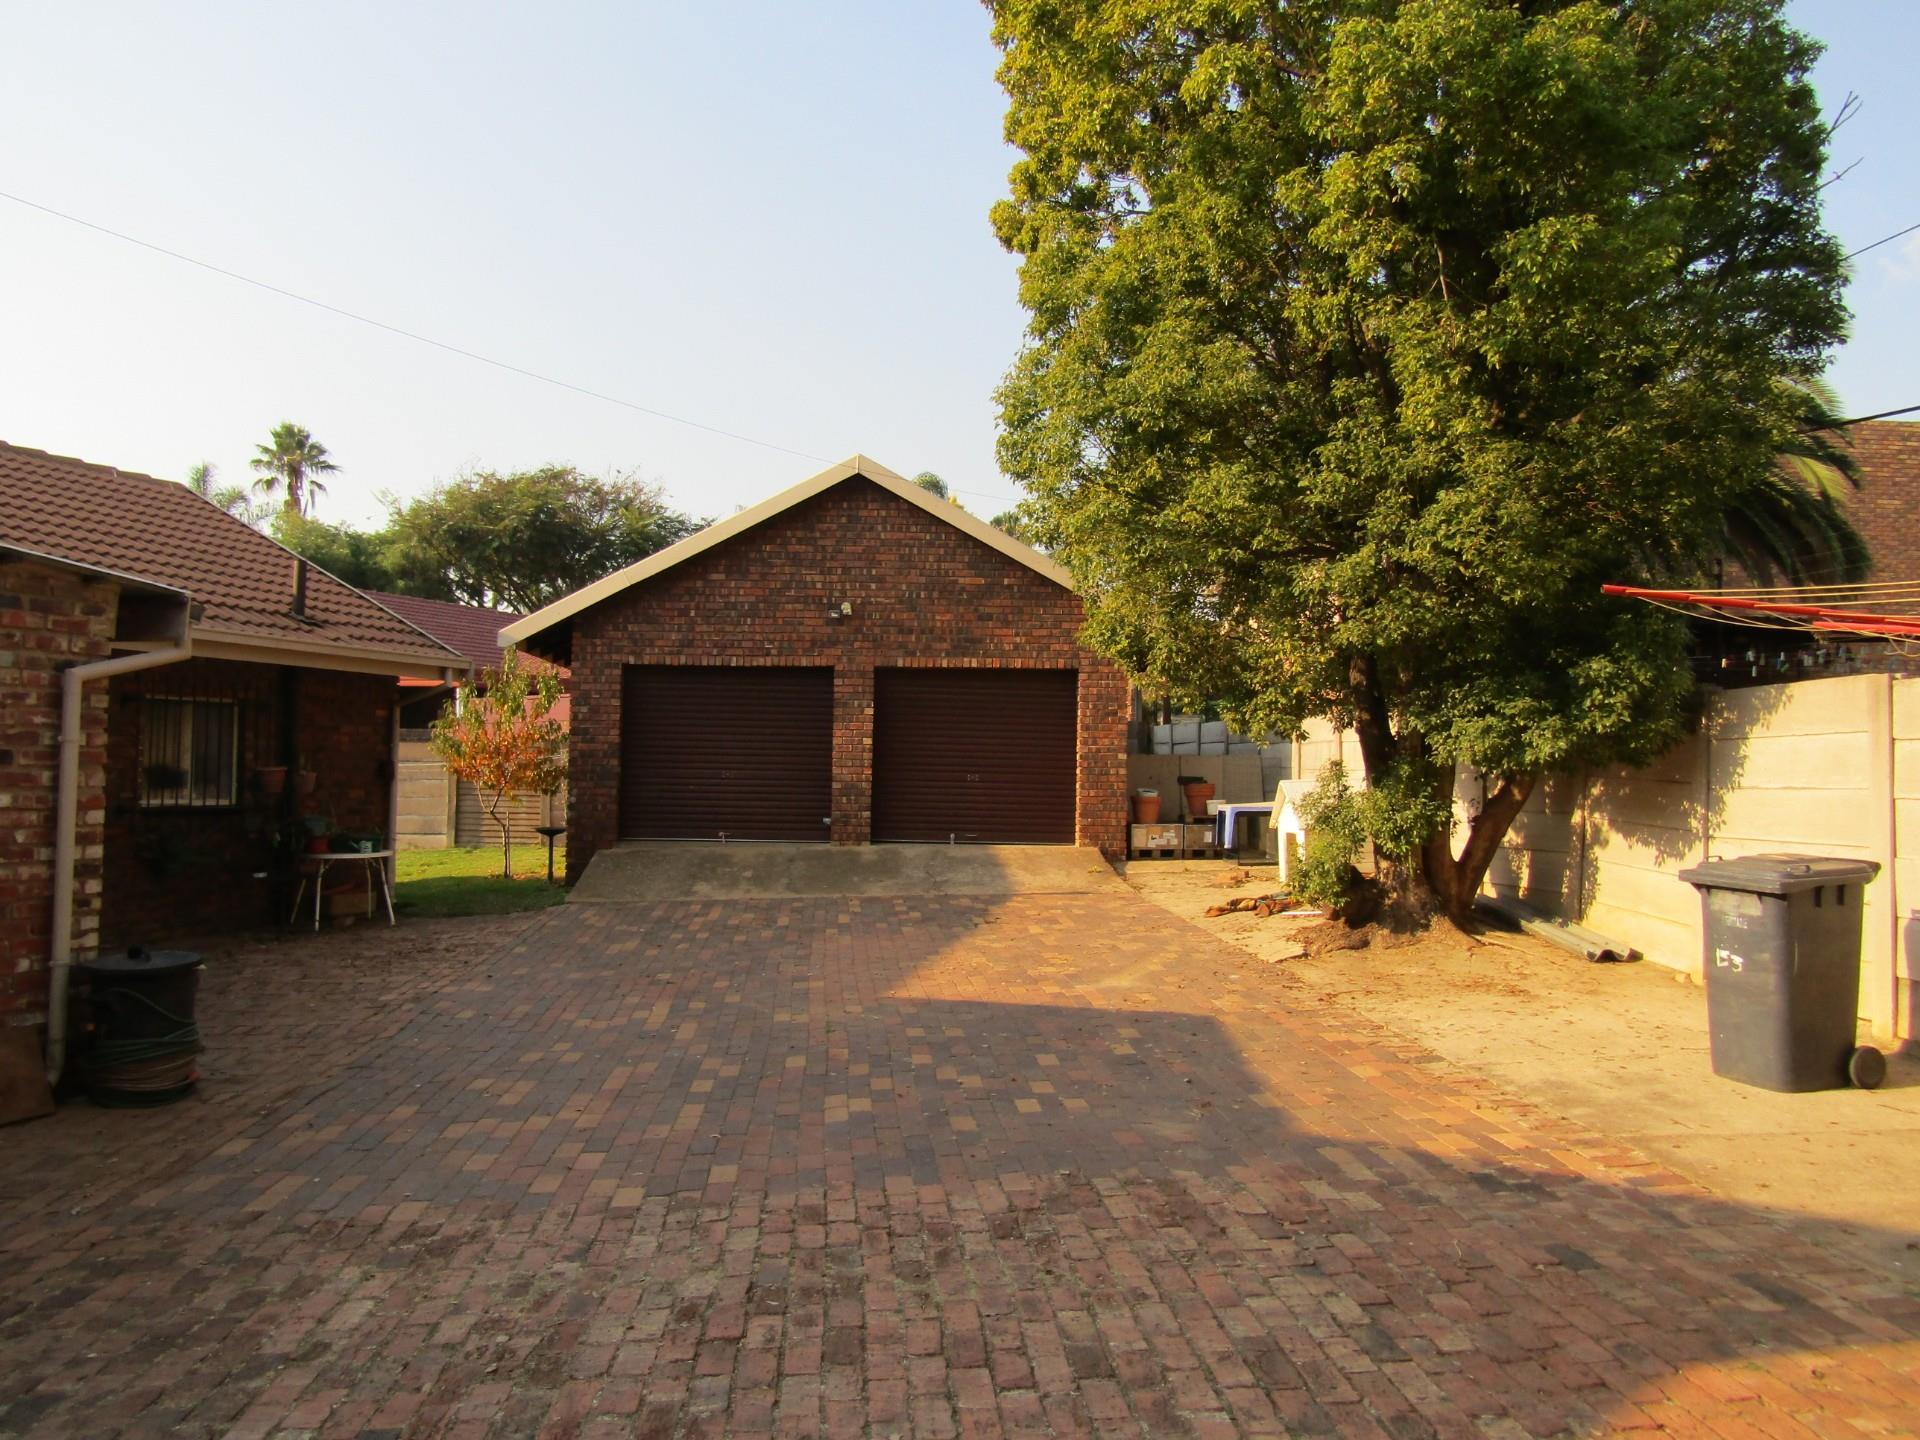 3 Bedroom House For Sale in Rooihuiskraal